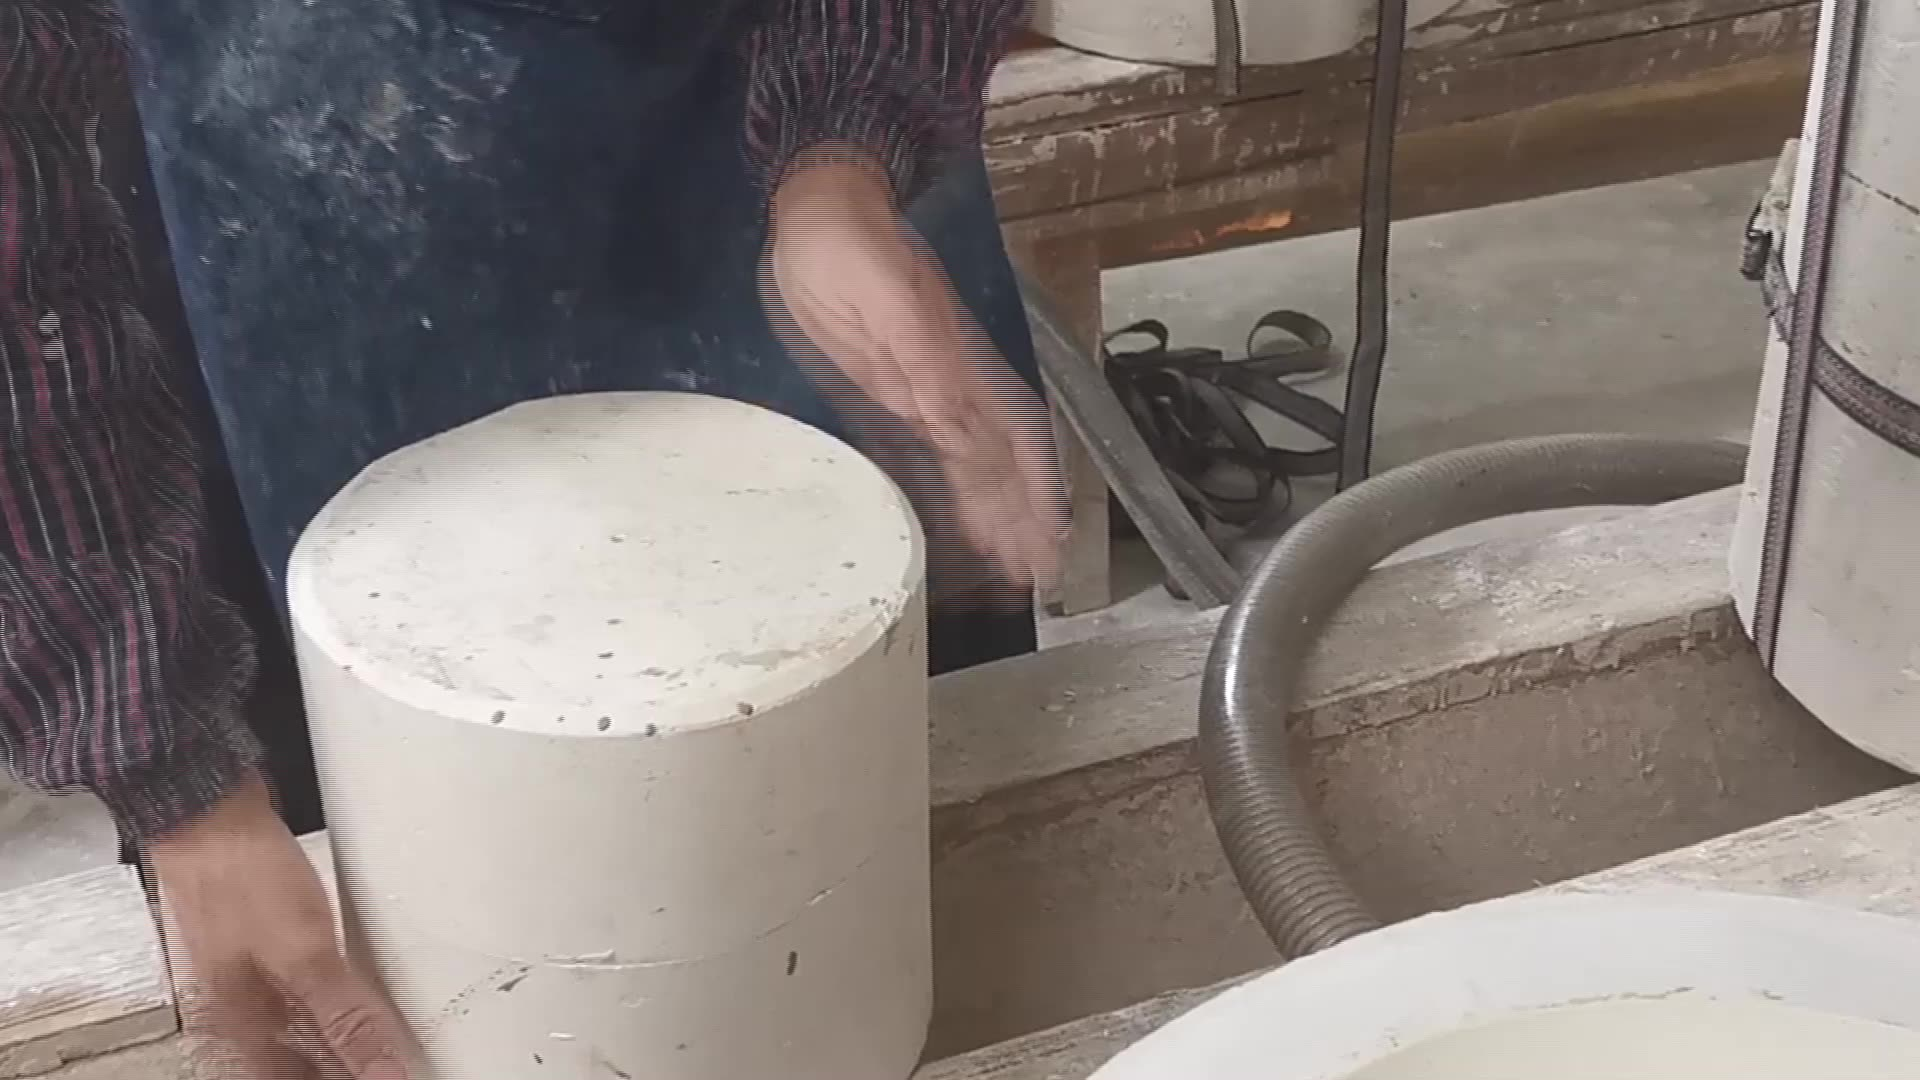 Estilo americano adornos de cerámica moderno blanco y negro de cerámica de tarro de mermelada frasco